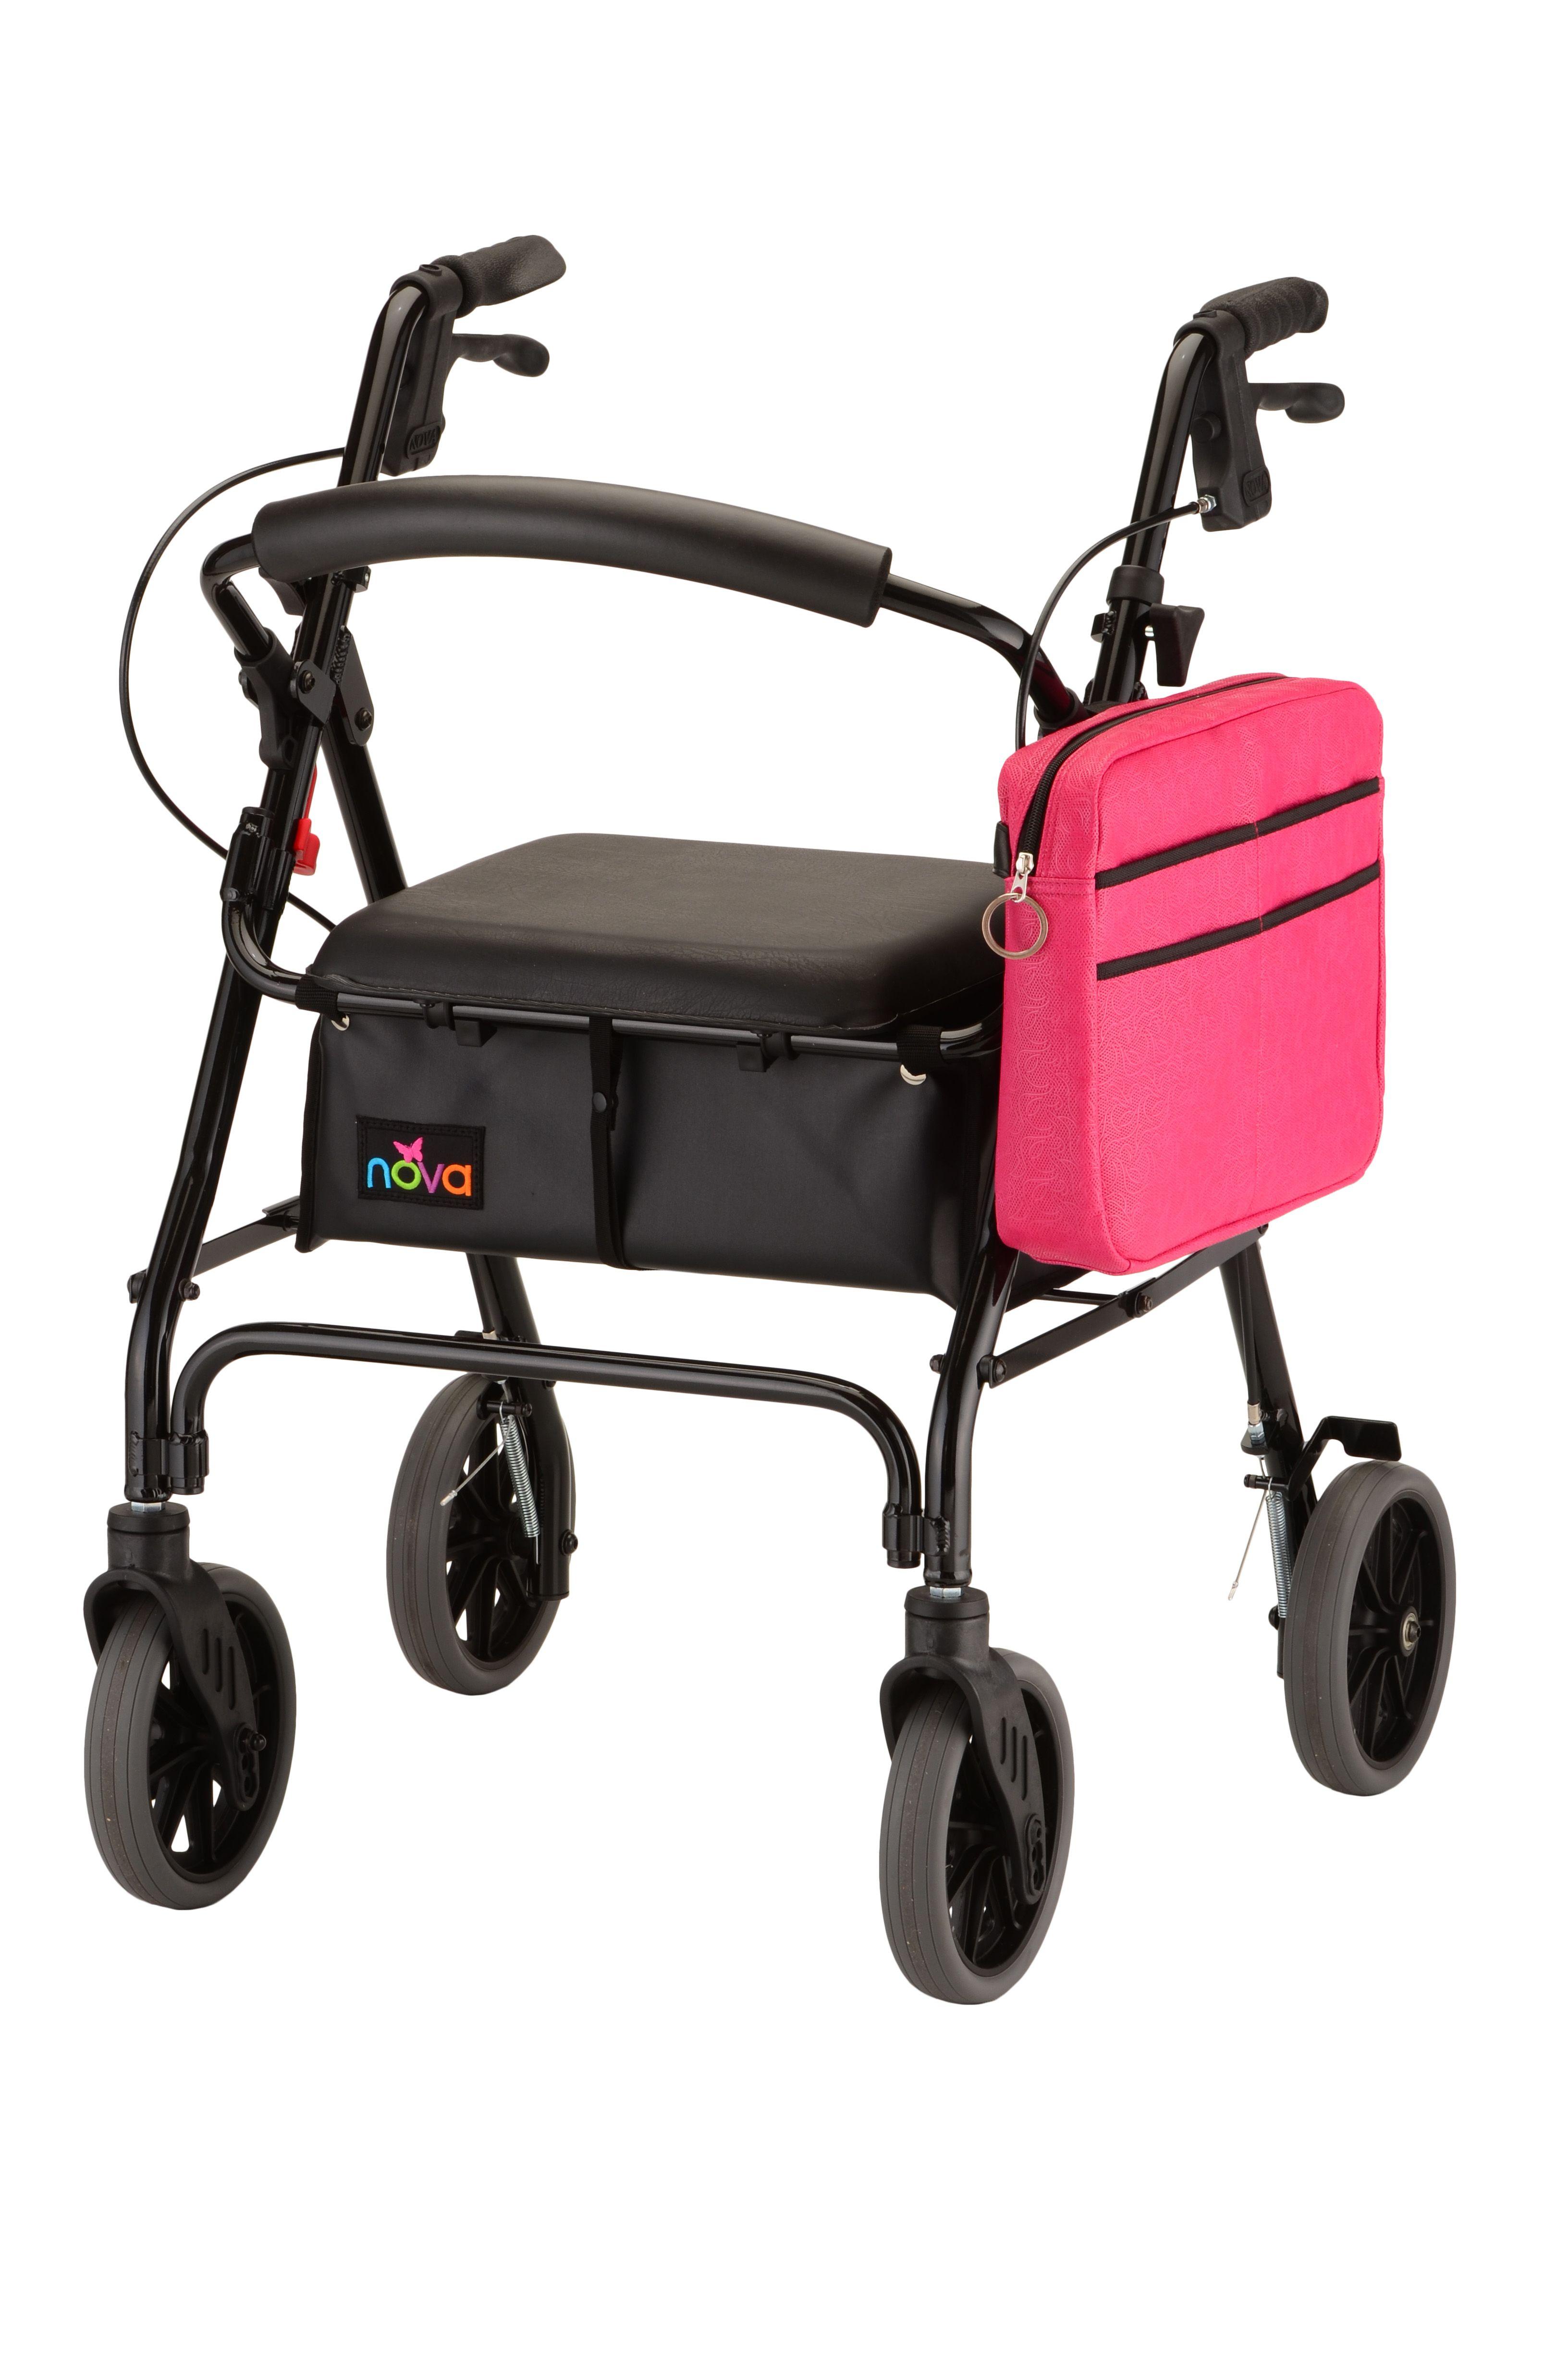 Mobility Accessories fashion style Fuschia, Bags